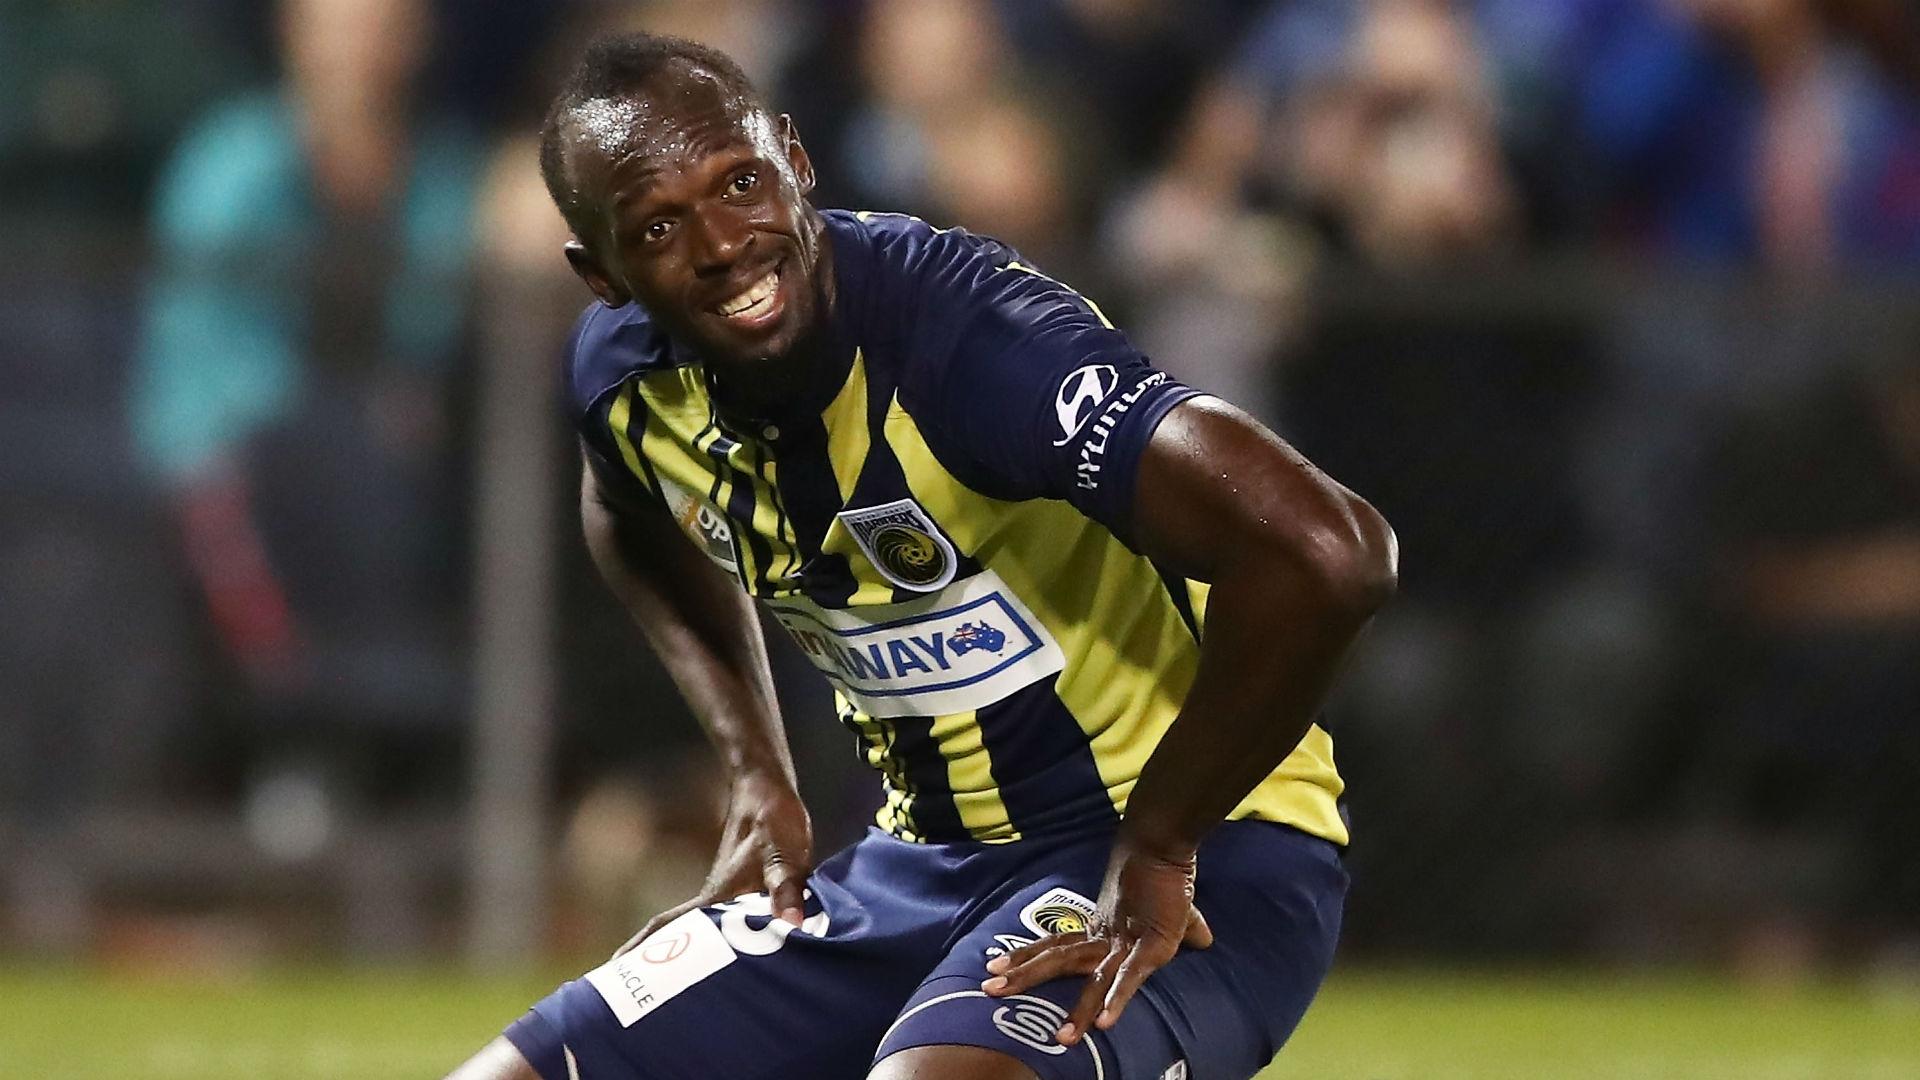 Usain Bolt, Central Coast Mariners part ways